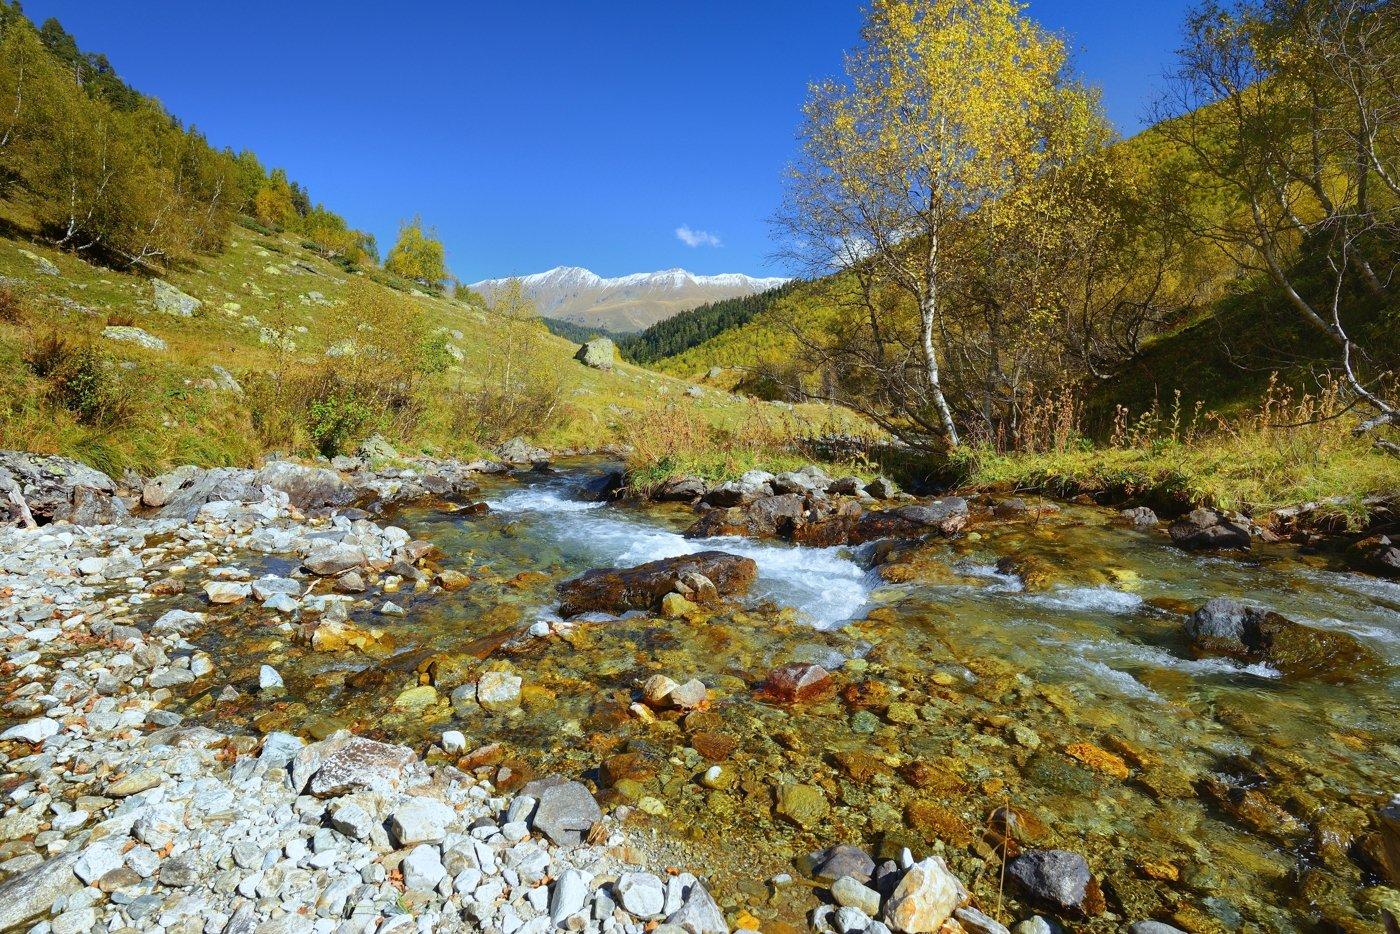 горы осень архыз утро ручей, Александр Жарников